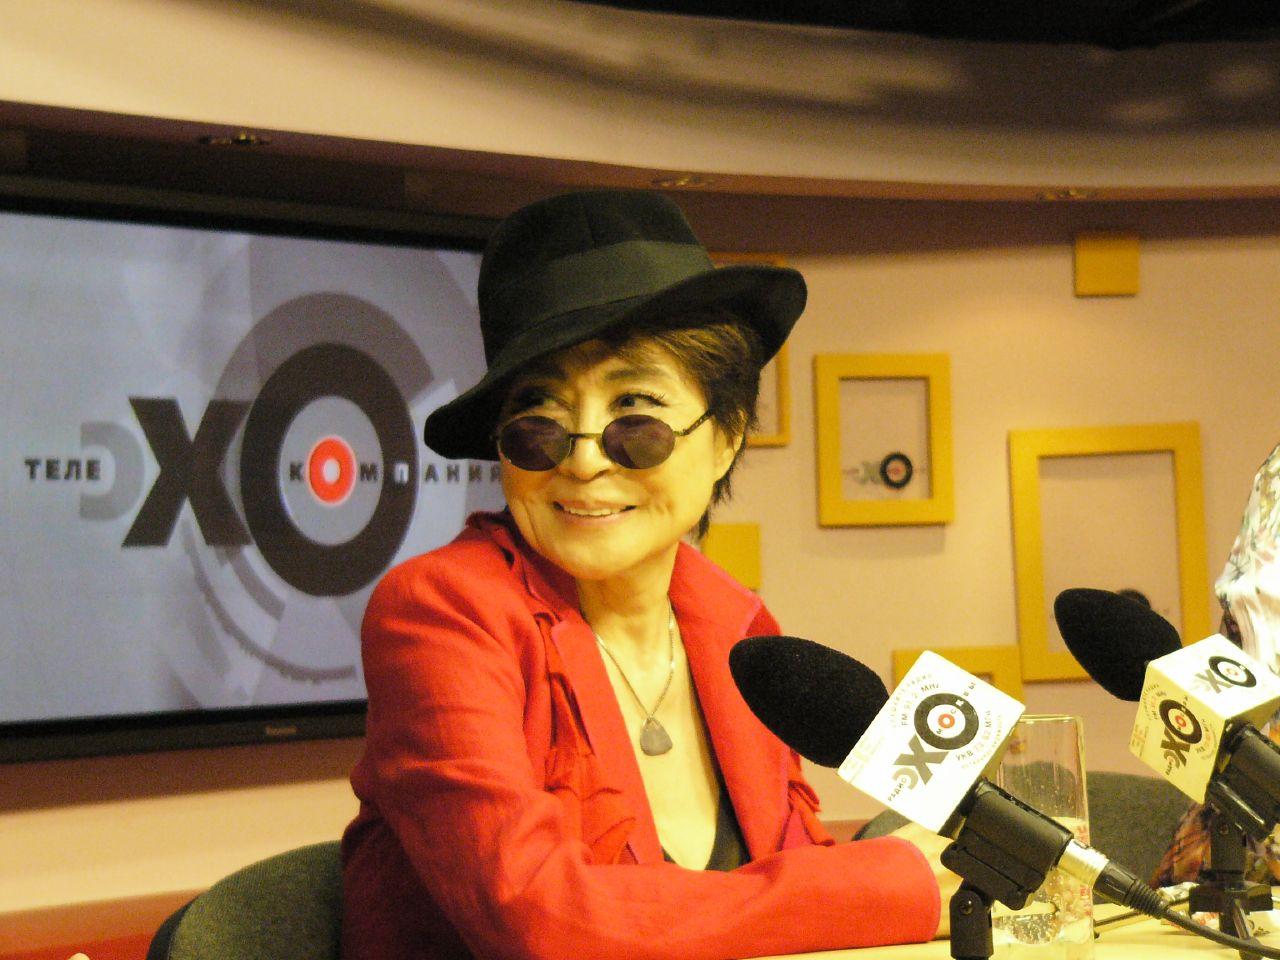 Yoko Ono Discography Wikipedia